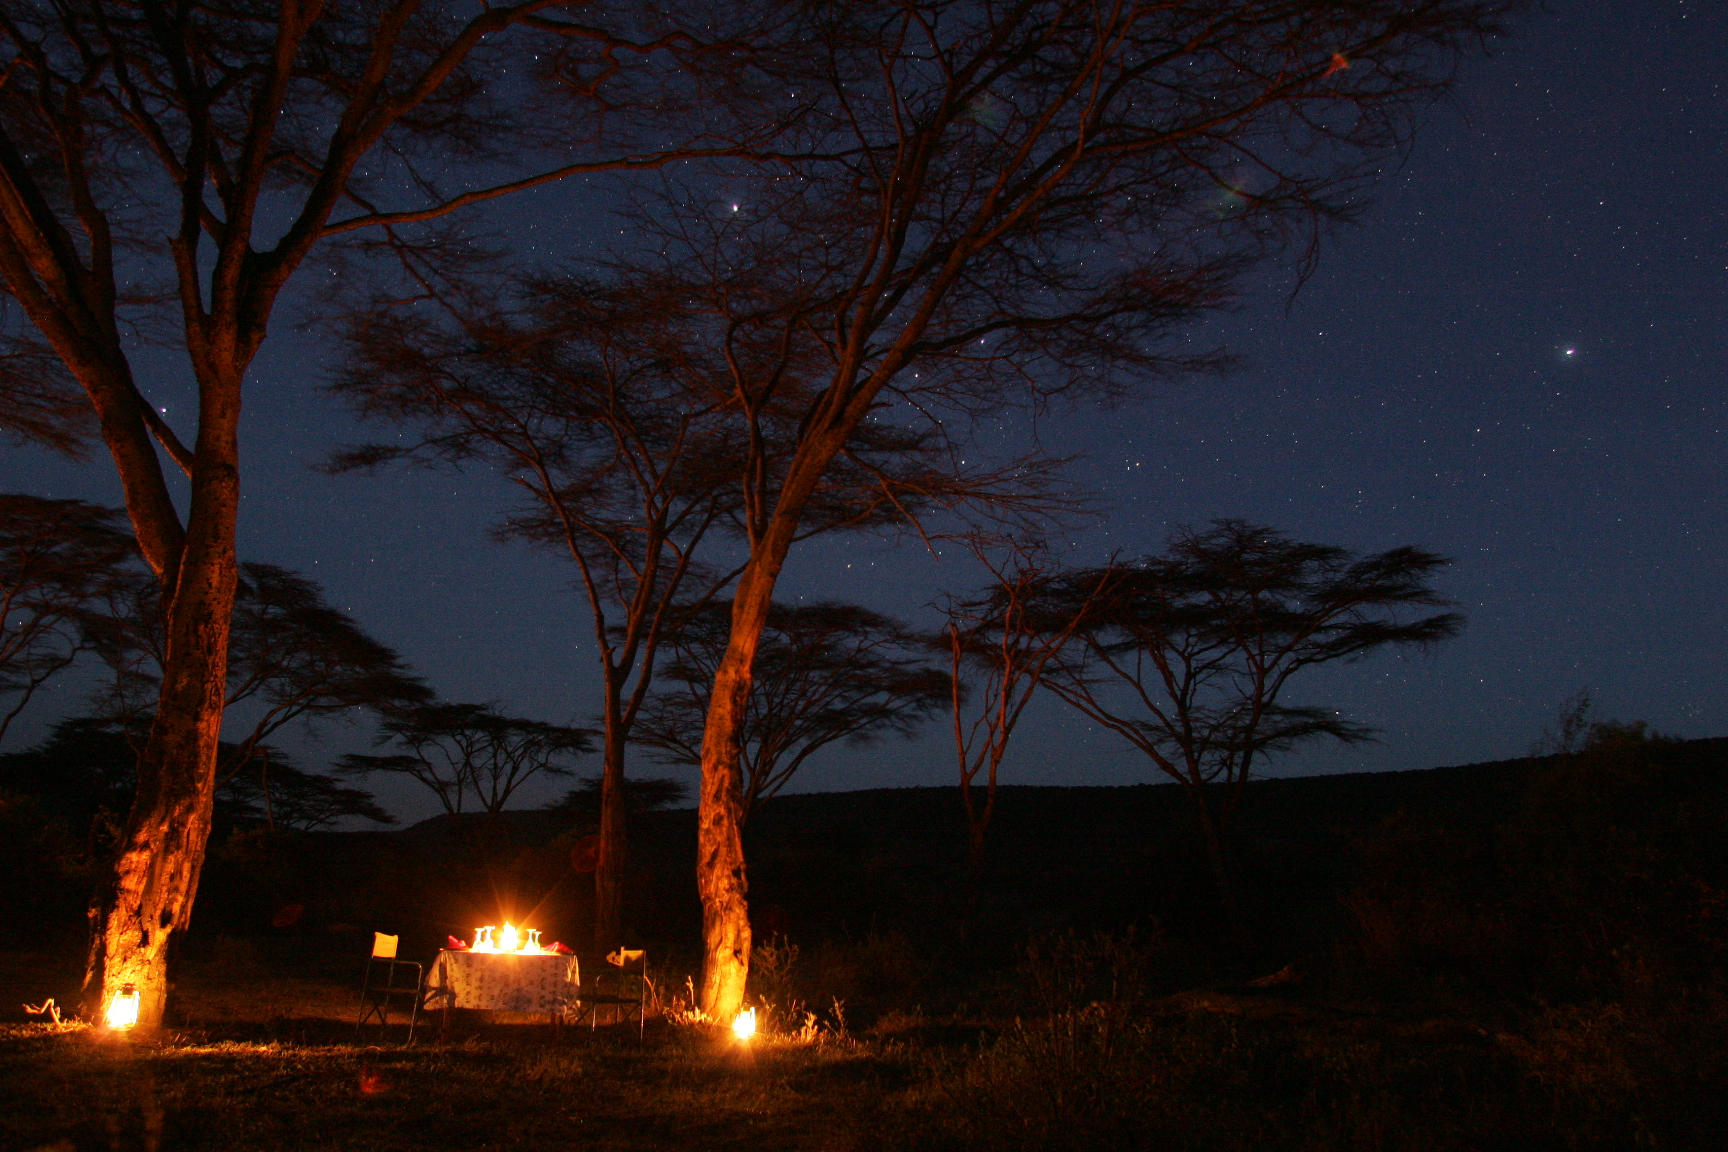 Saruni bush dinner in the Mara